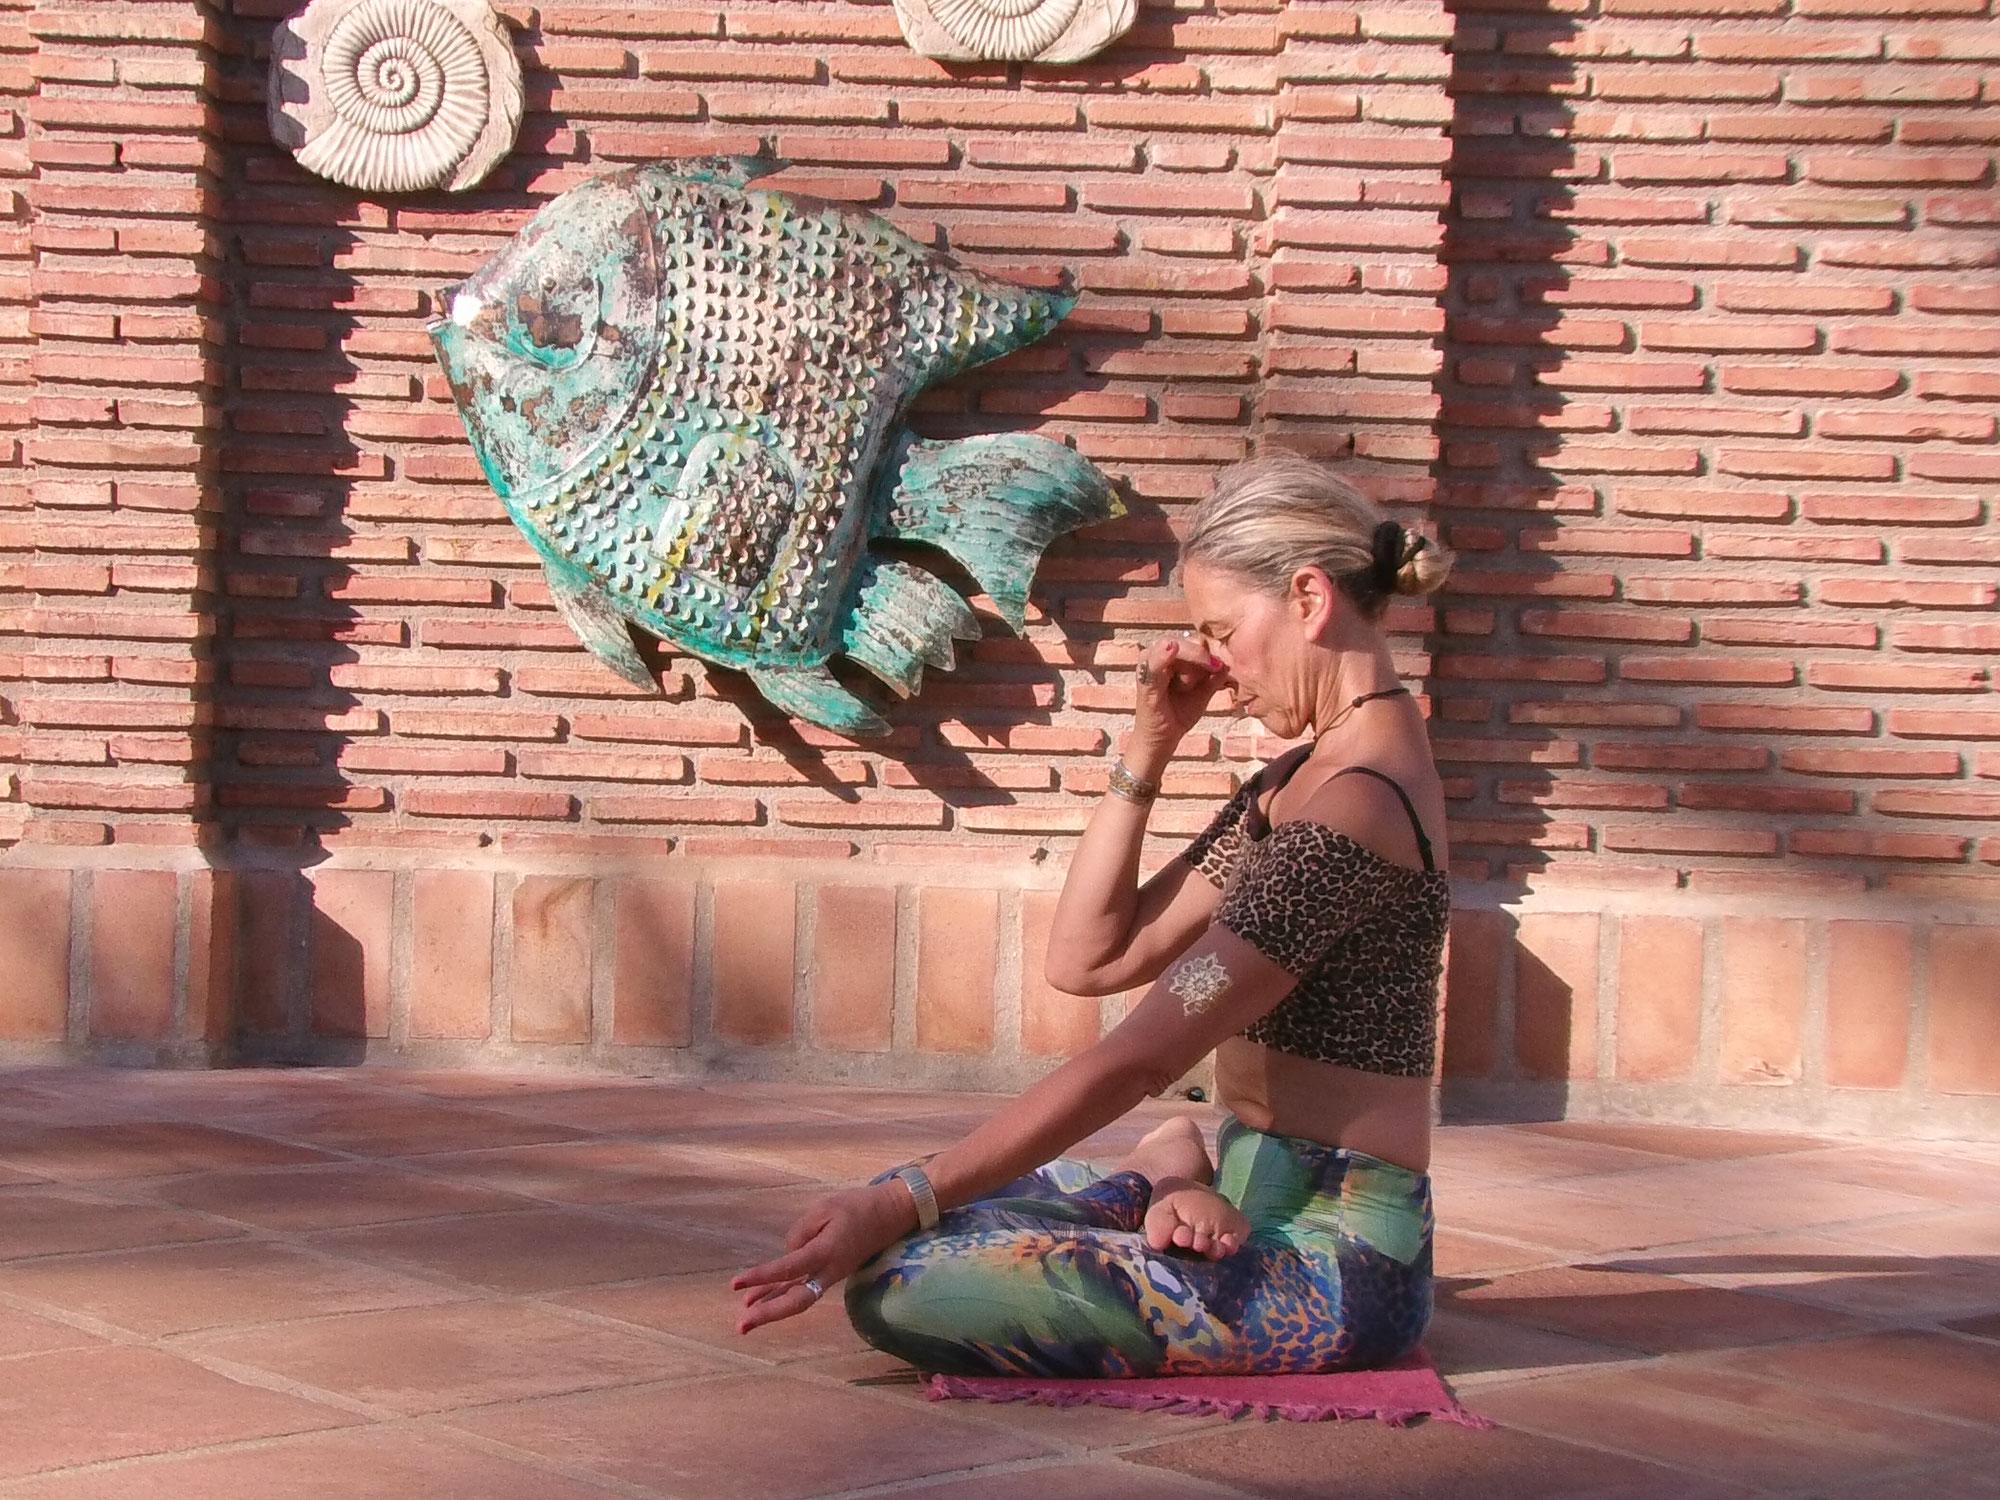 ASHTANGA VINYASA YOGA, VINYASA KRAMA and the Sri T. Krishnamacharya Tradition -BLOGpost 8 - Excursion on fast Pranayamas - Bastri and Kapalabhati